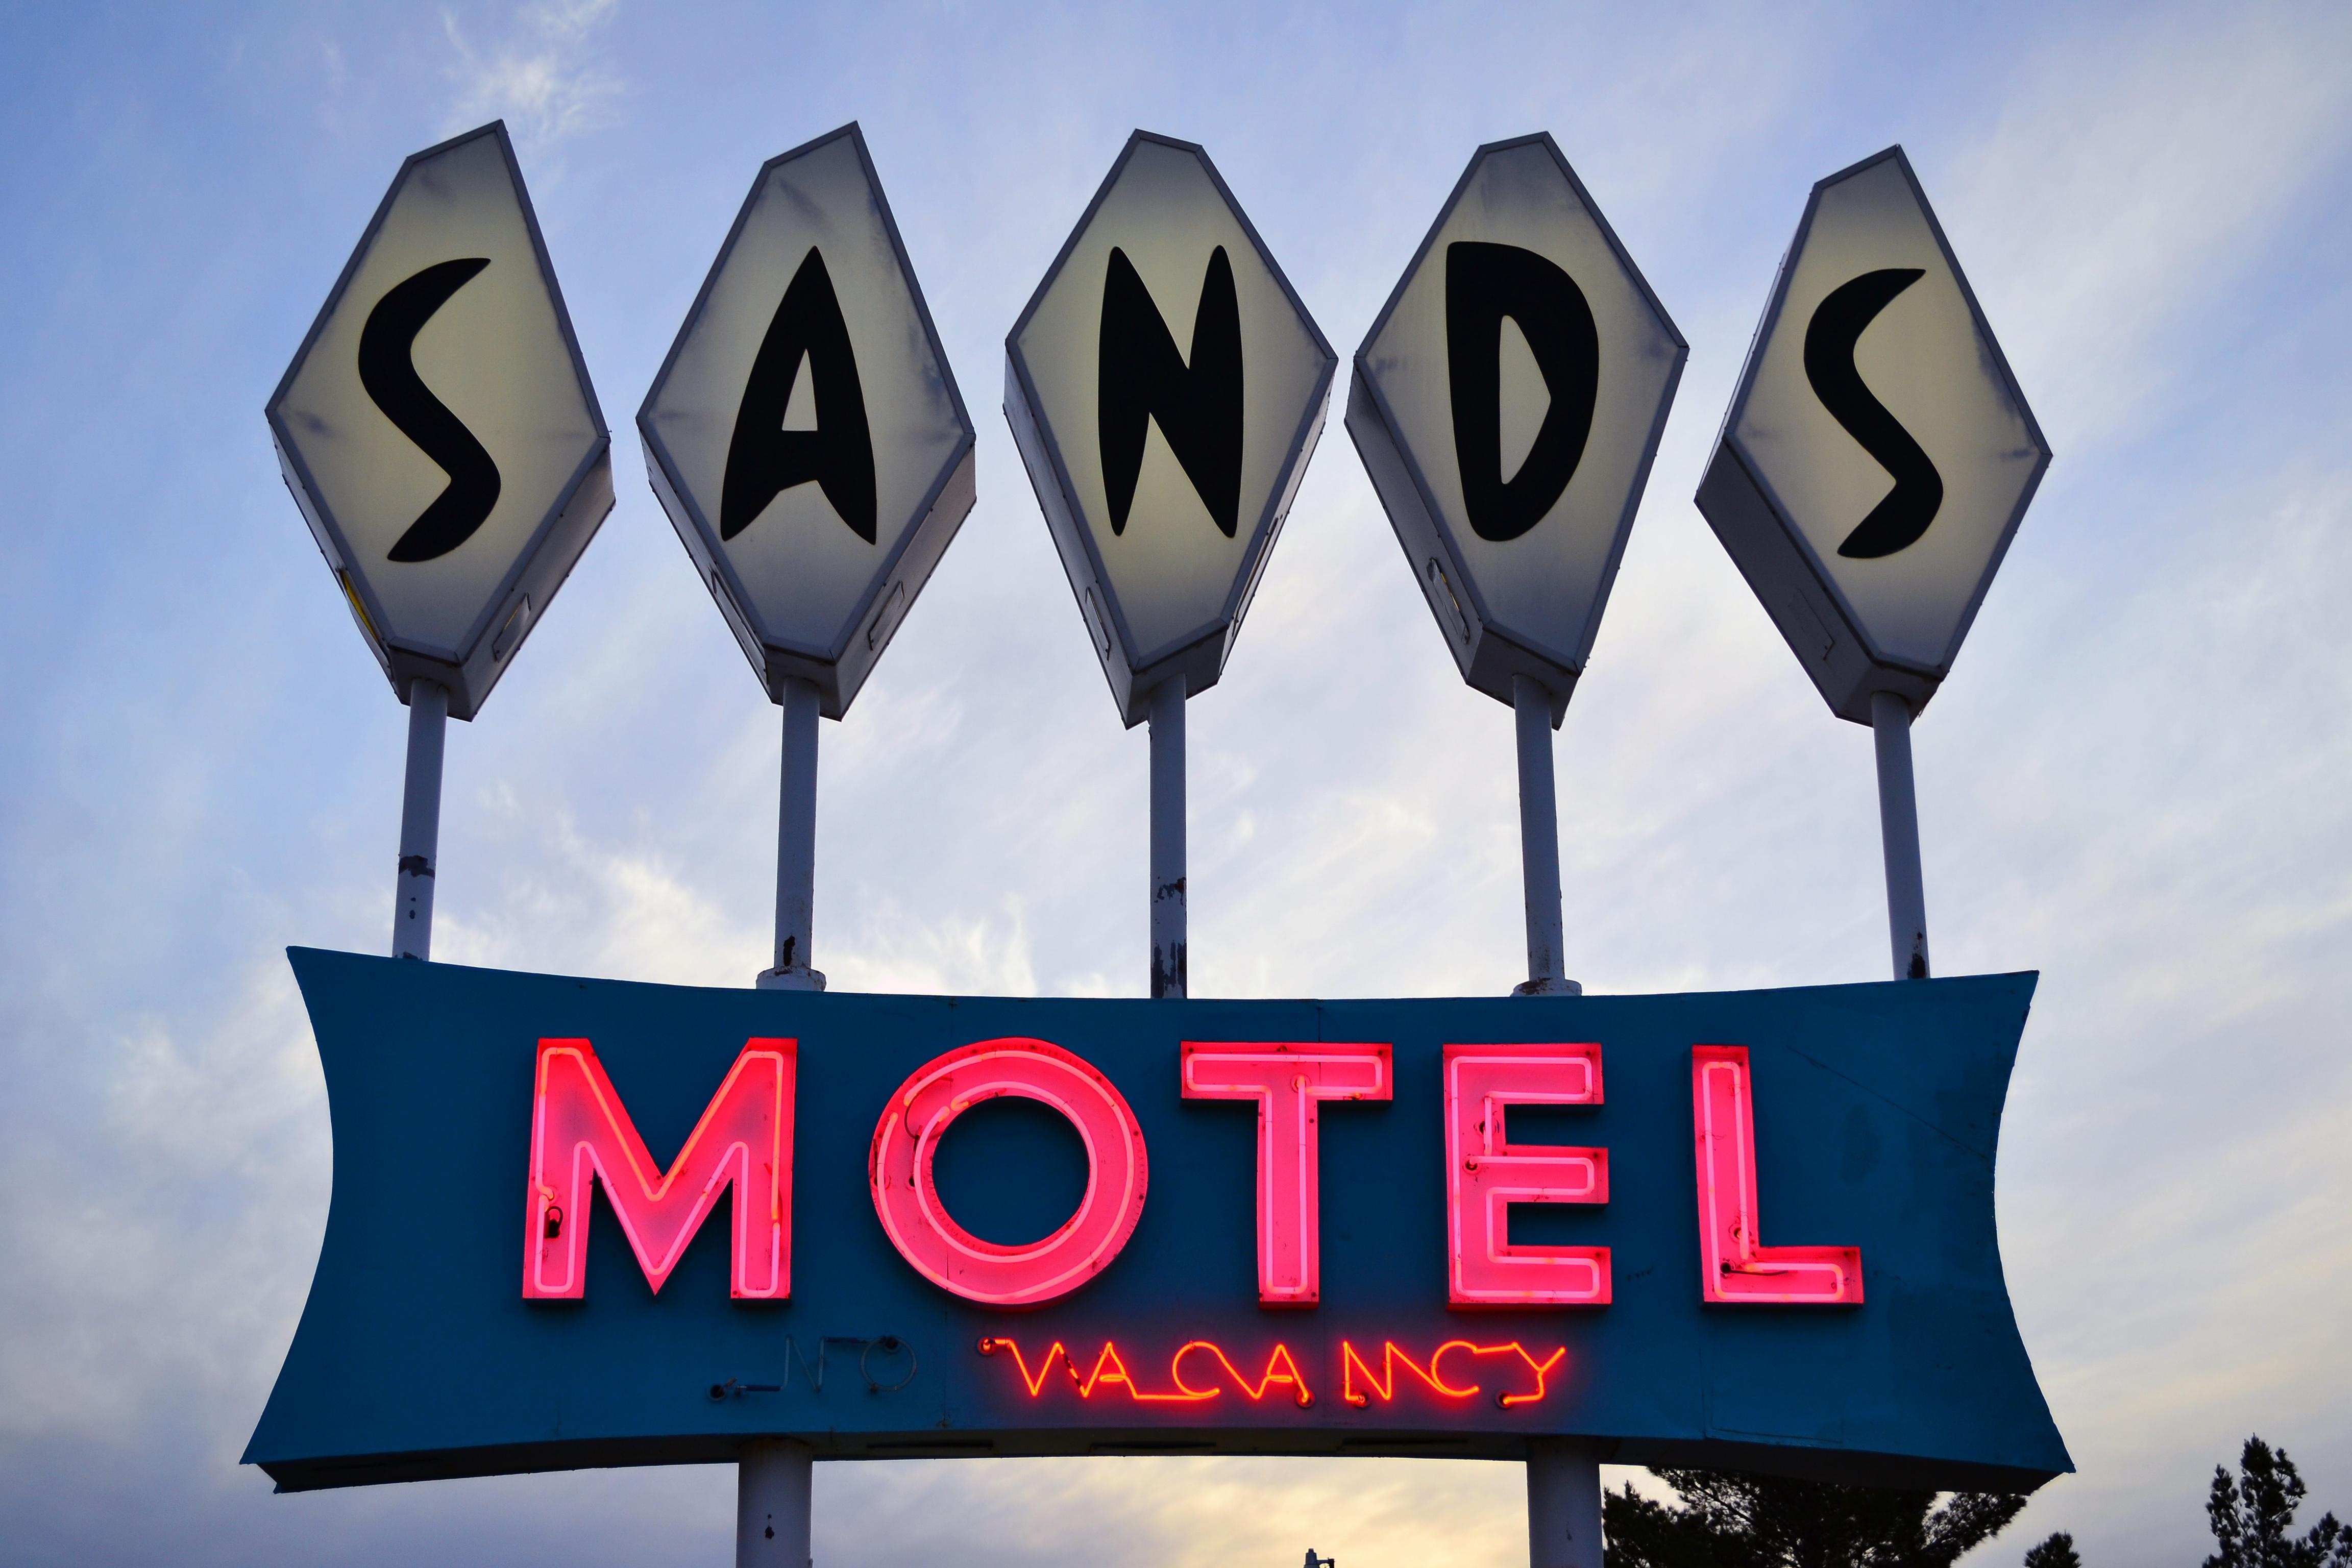 Sands Motel - 1400 Central Avenue, Carrizozo, New Mexico U.S.A. - November 27, 2013